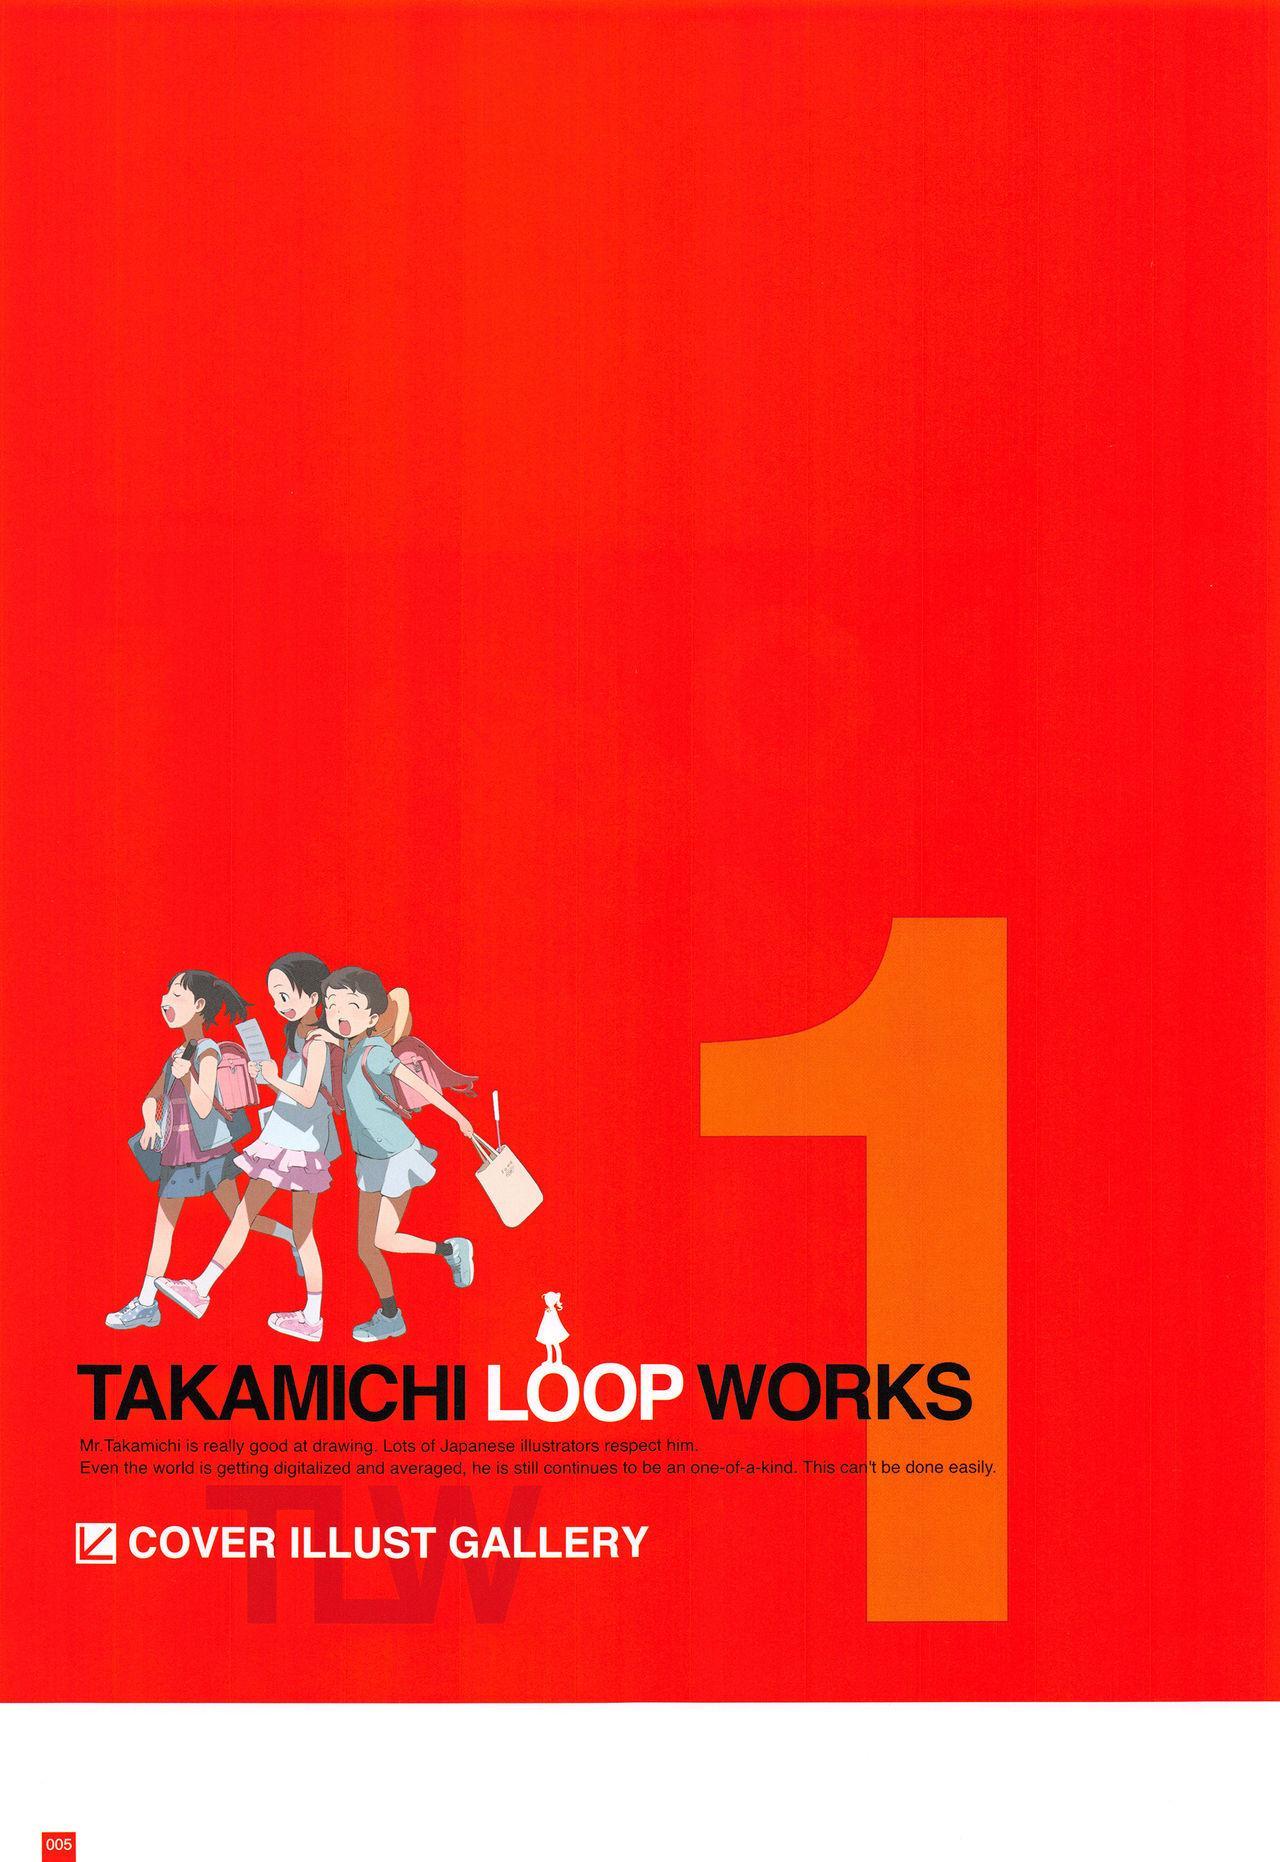 LO Artbook 2-A TAKAMICHI LOOP WORKS 7